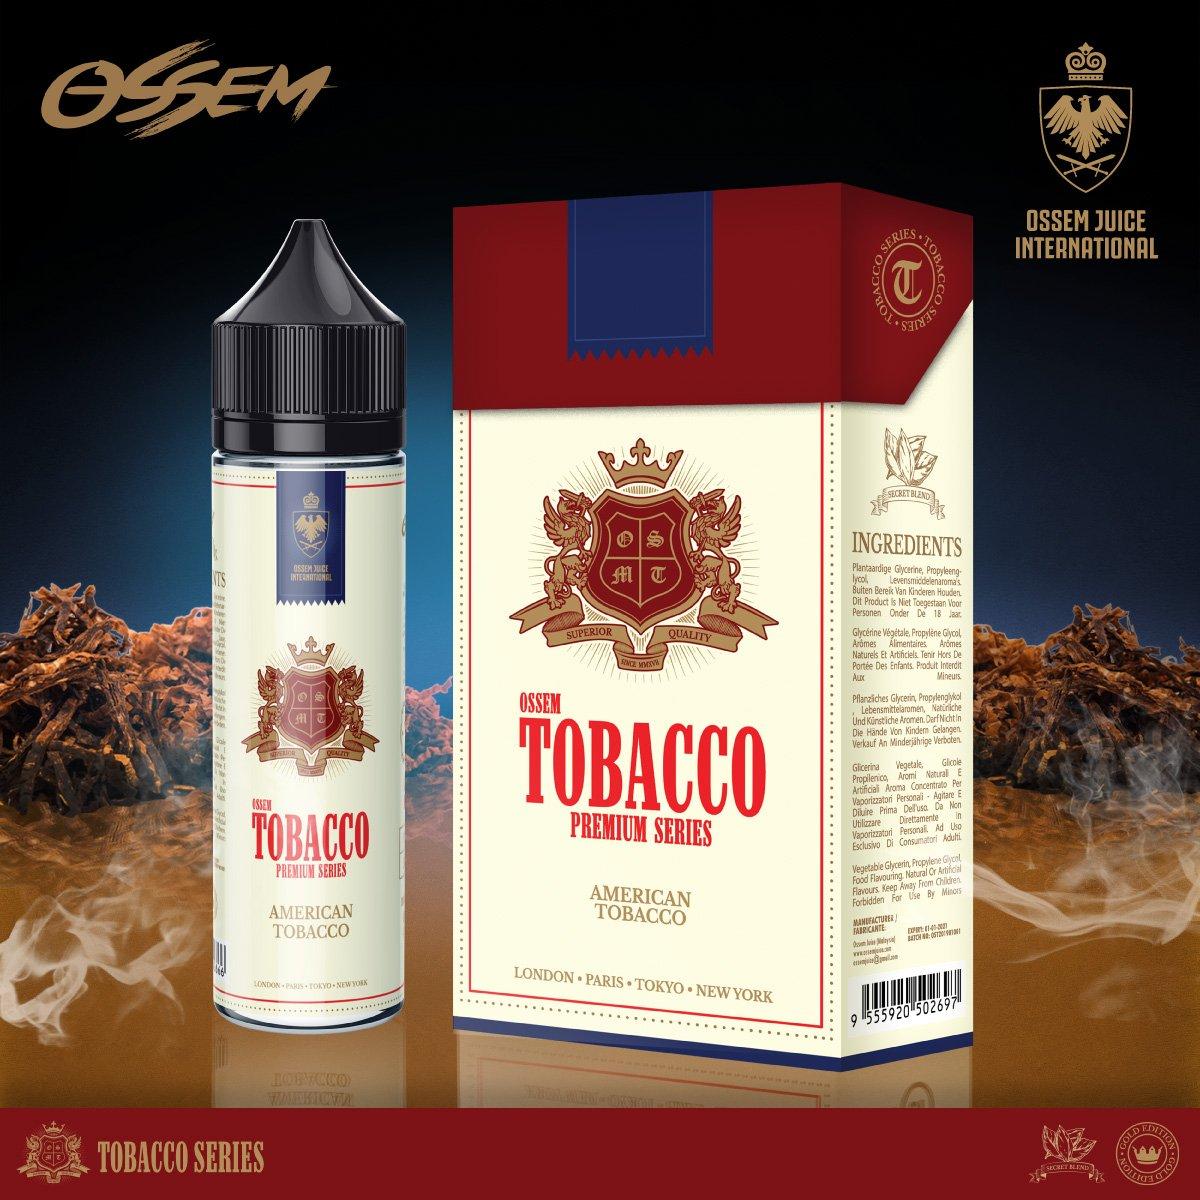 American Tobacco 60ML - Ossem Juice